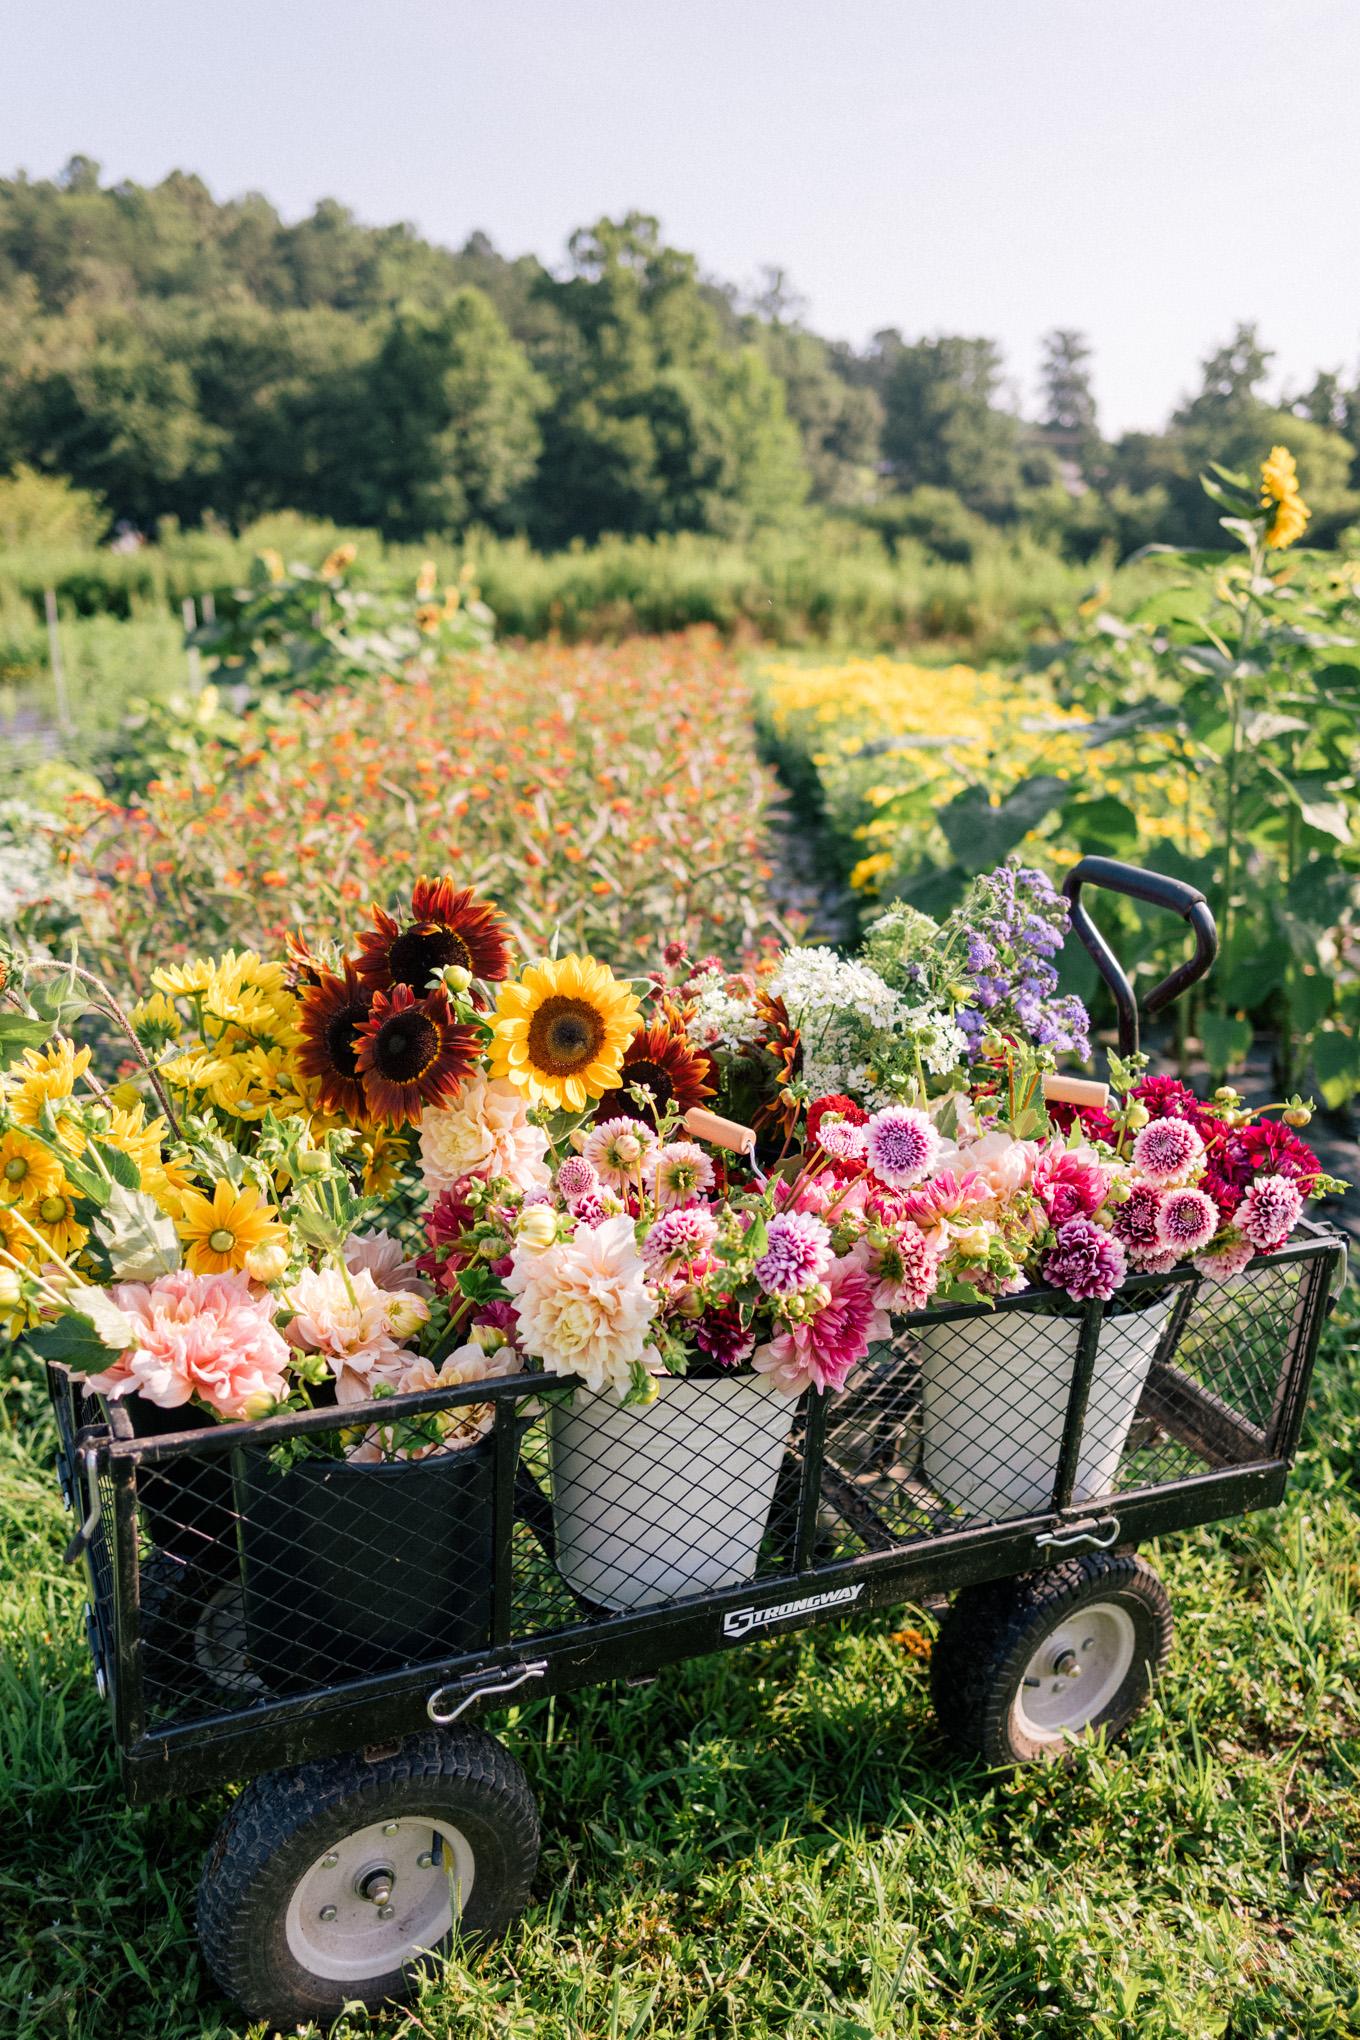 gmg-flourish-flower-farm-asheville-nc-1003349